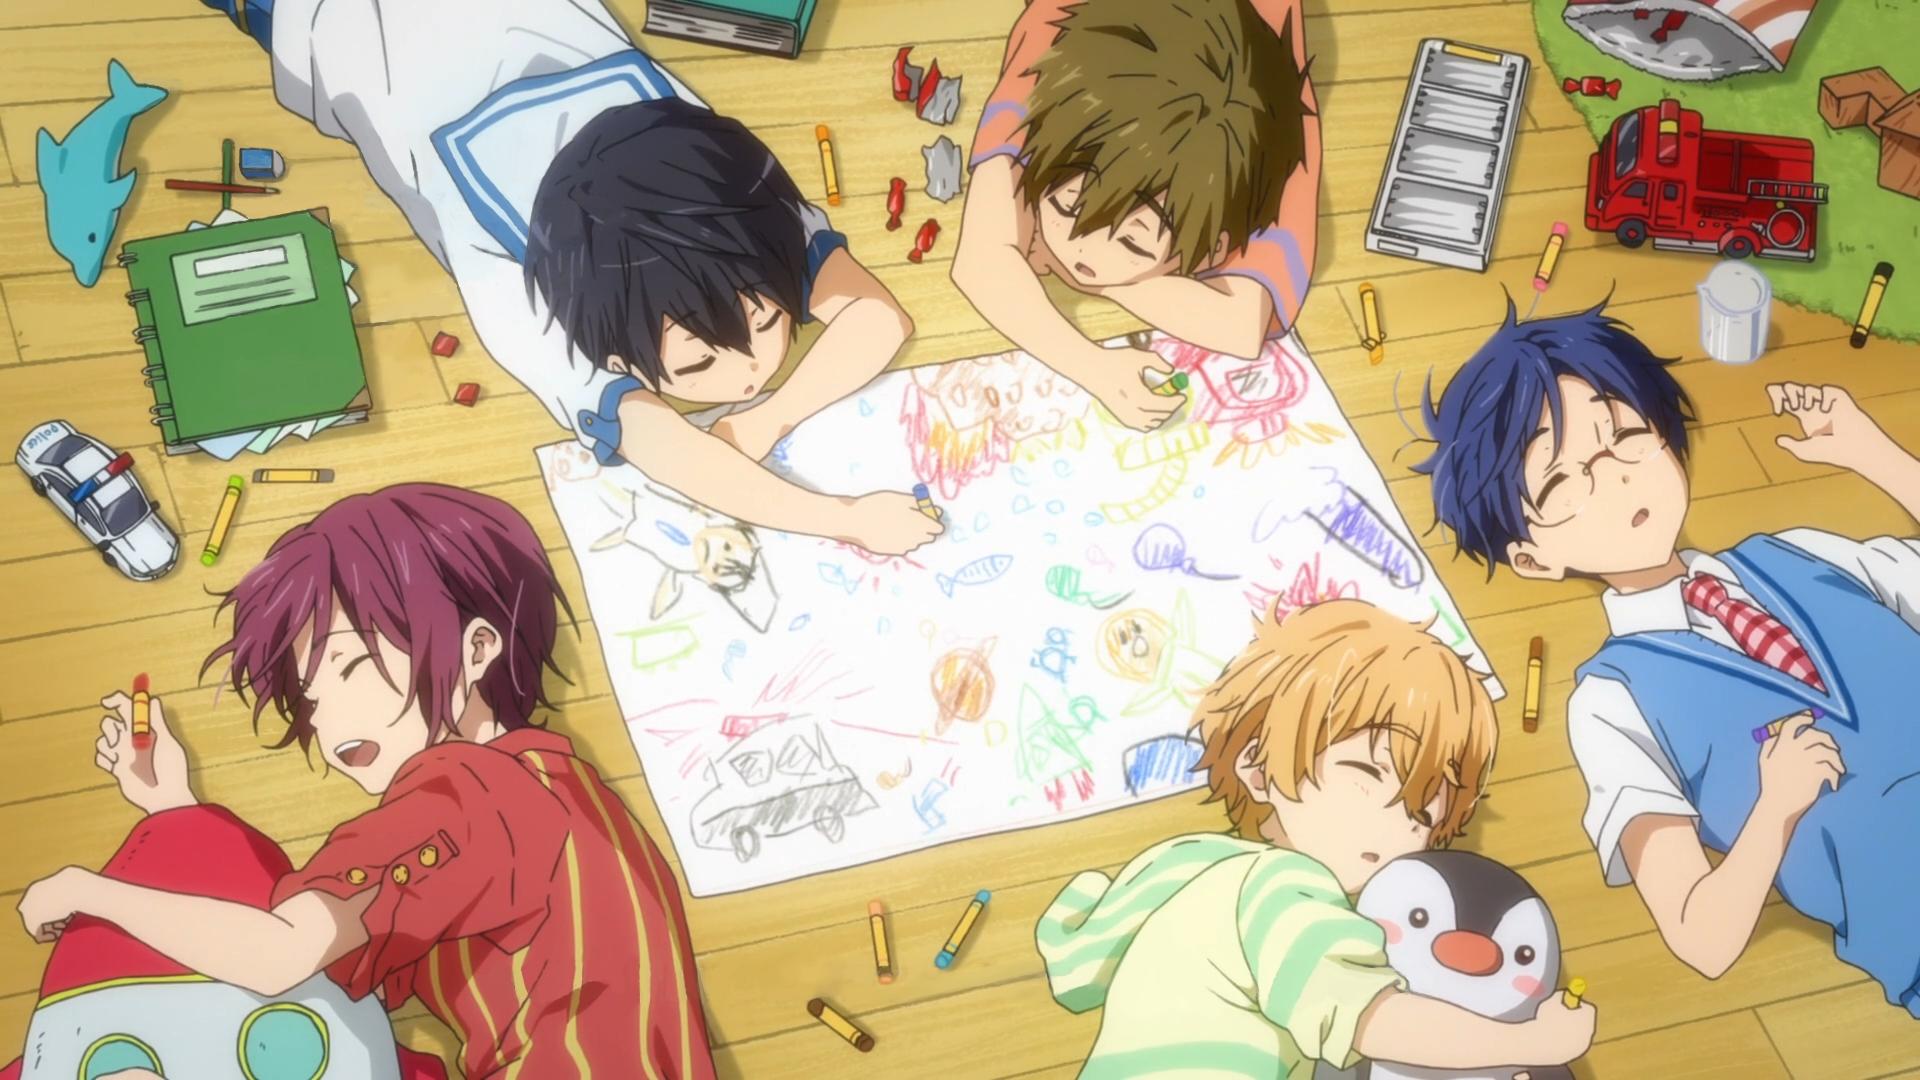 Free hd wallpaper 1738665 zerochan anime image board tags anime kyoto animation free nanase haruka free voltagebd Choice Image